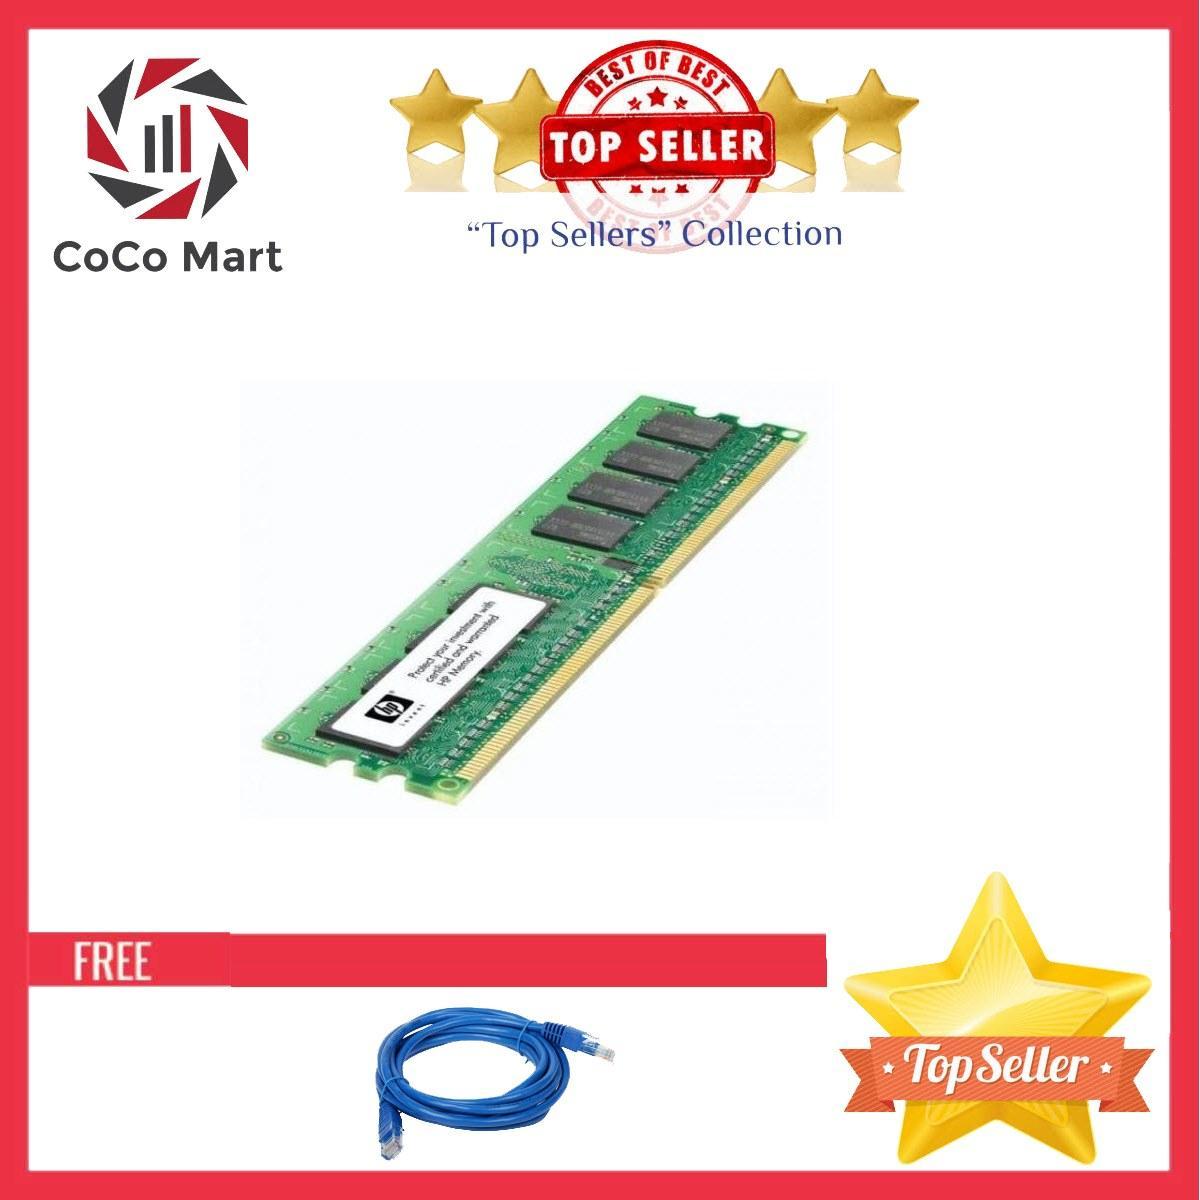 Ram ECC Máy Trạm HP 4GB, DDR 3, Bus 1333Mhz Siêu Bền